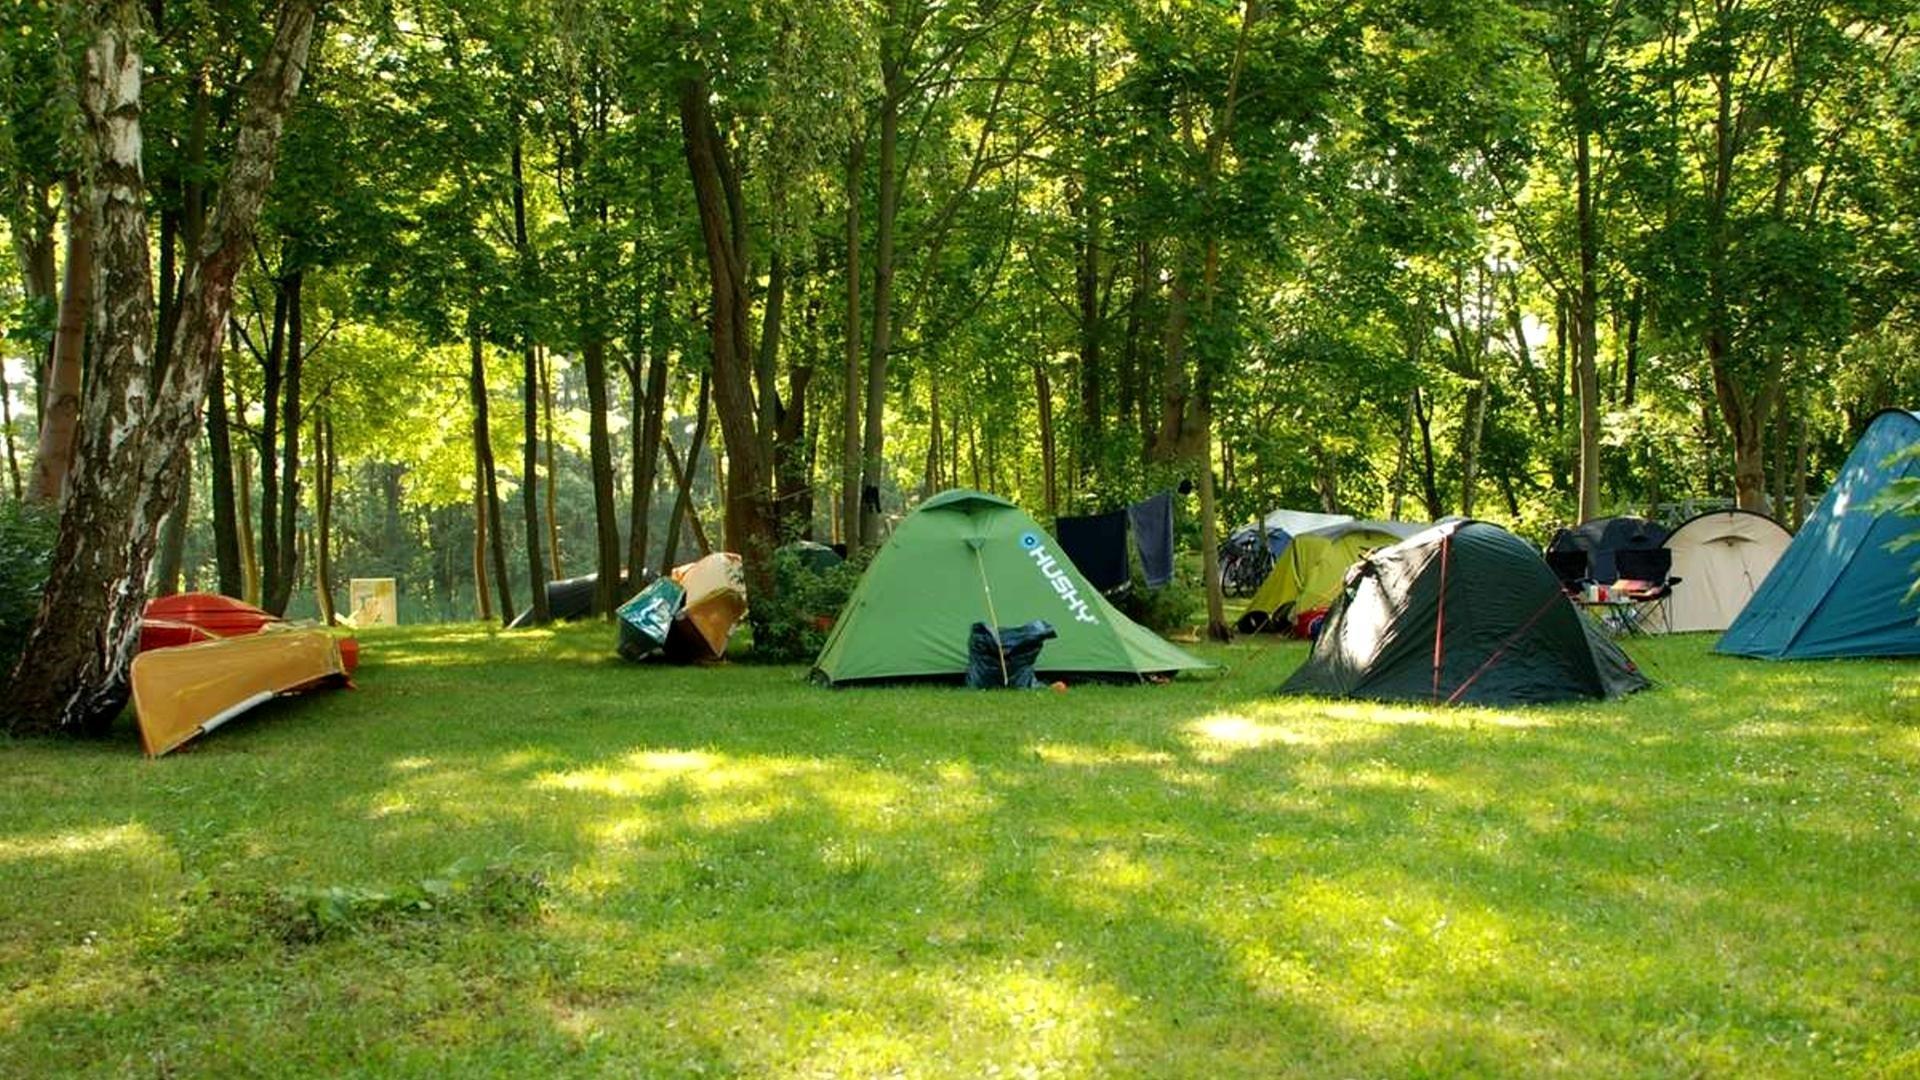 Camping-Zelten-Mecklenburg-Seenkette-Mueritz-Alter-Hafen-Klassenfahrt-Klassenreise-02